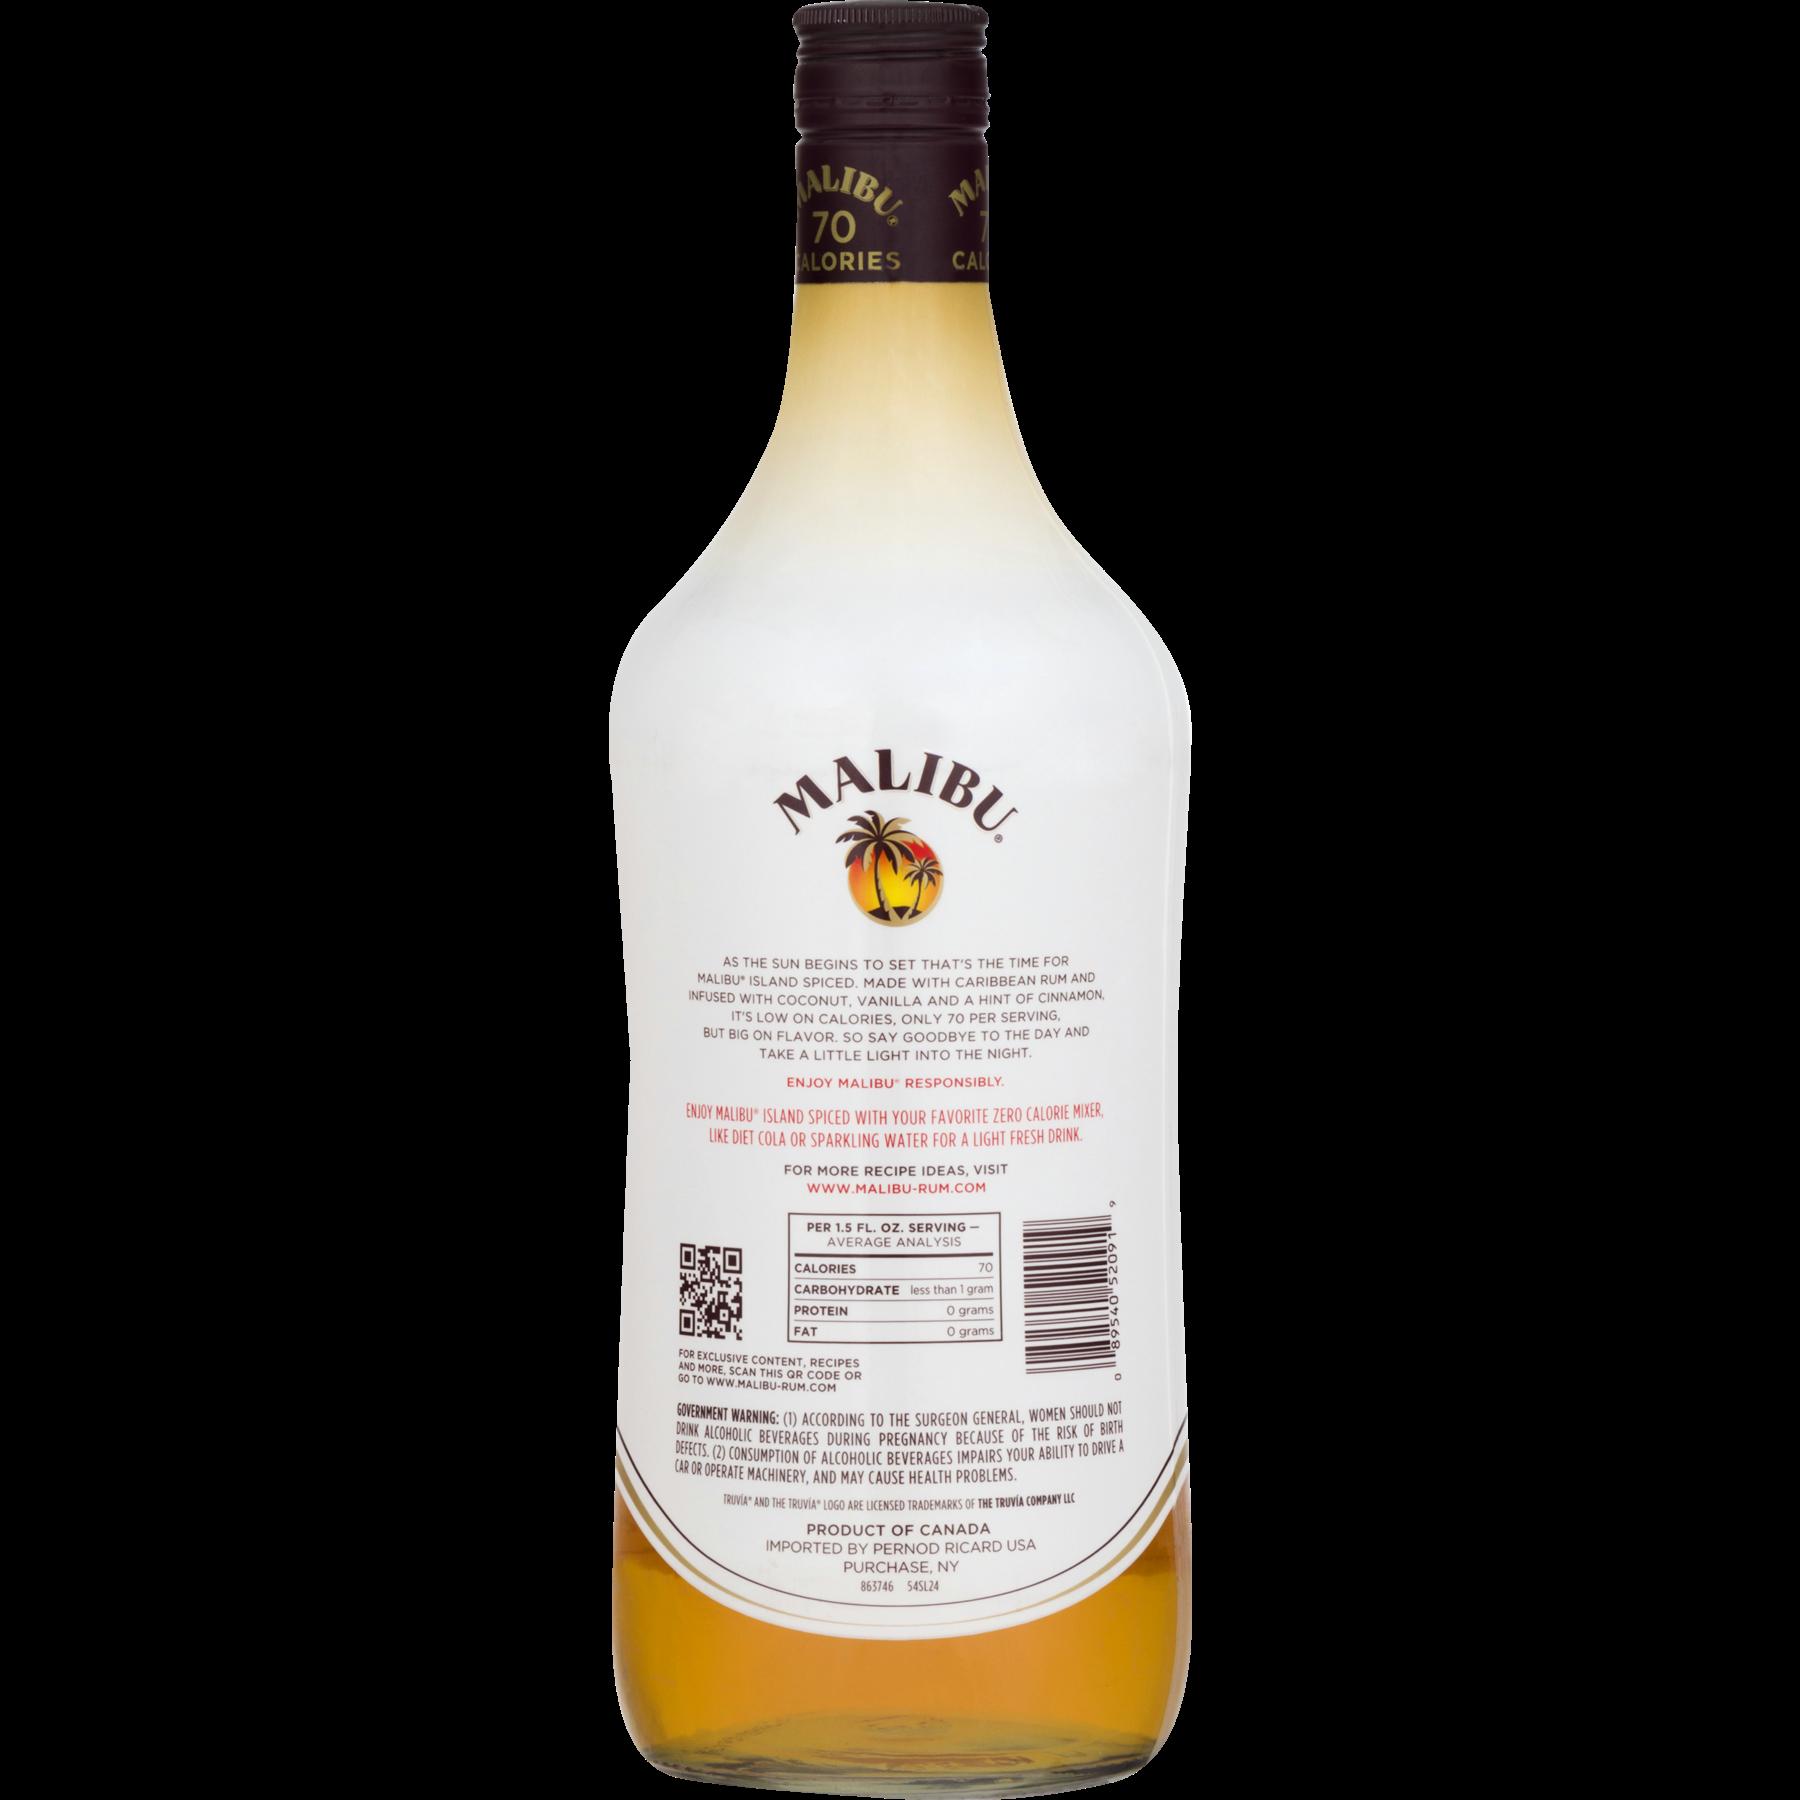 Low Calorie Malibu Rum Drink Recipes